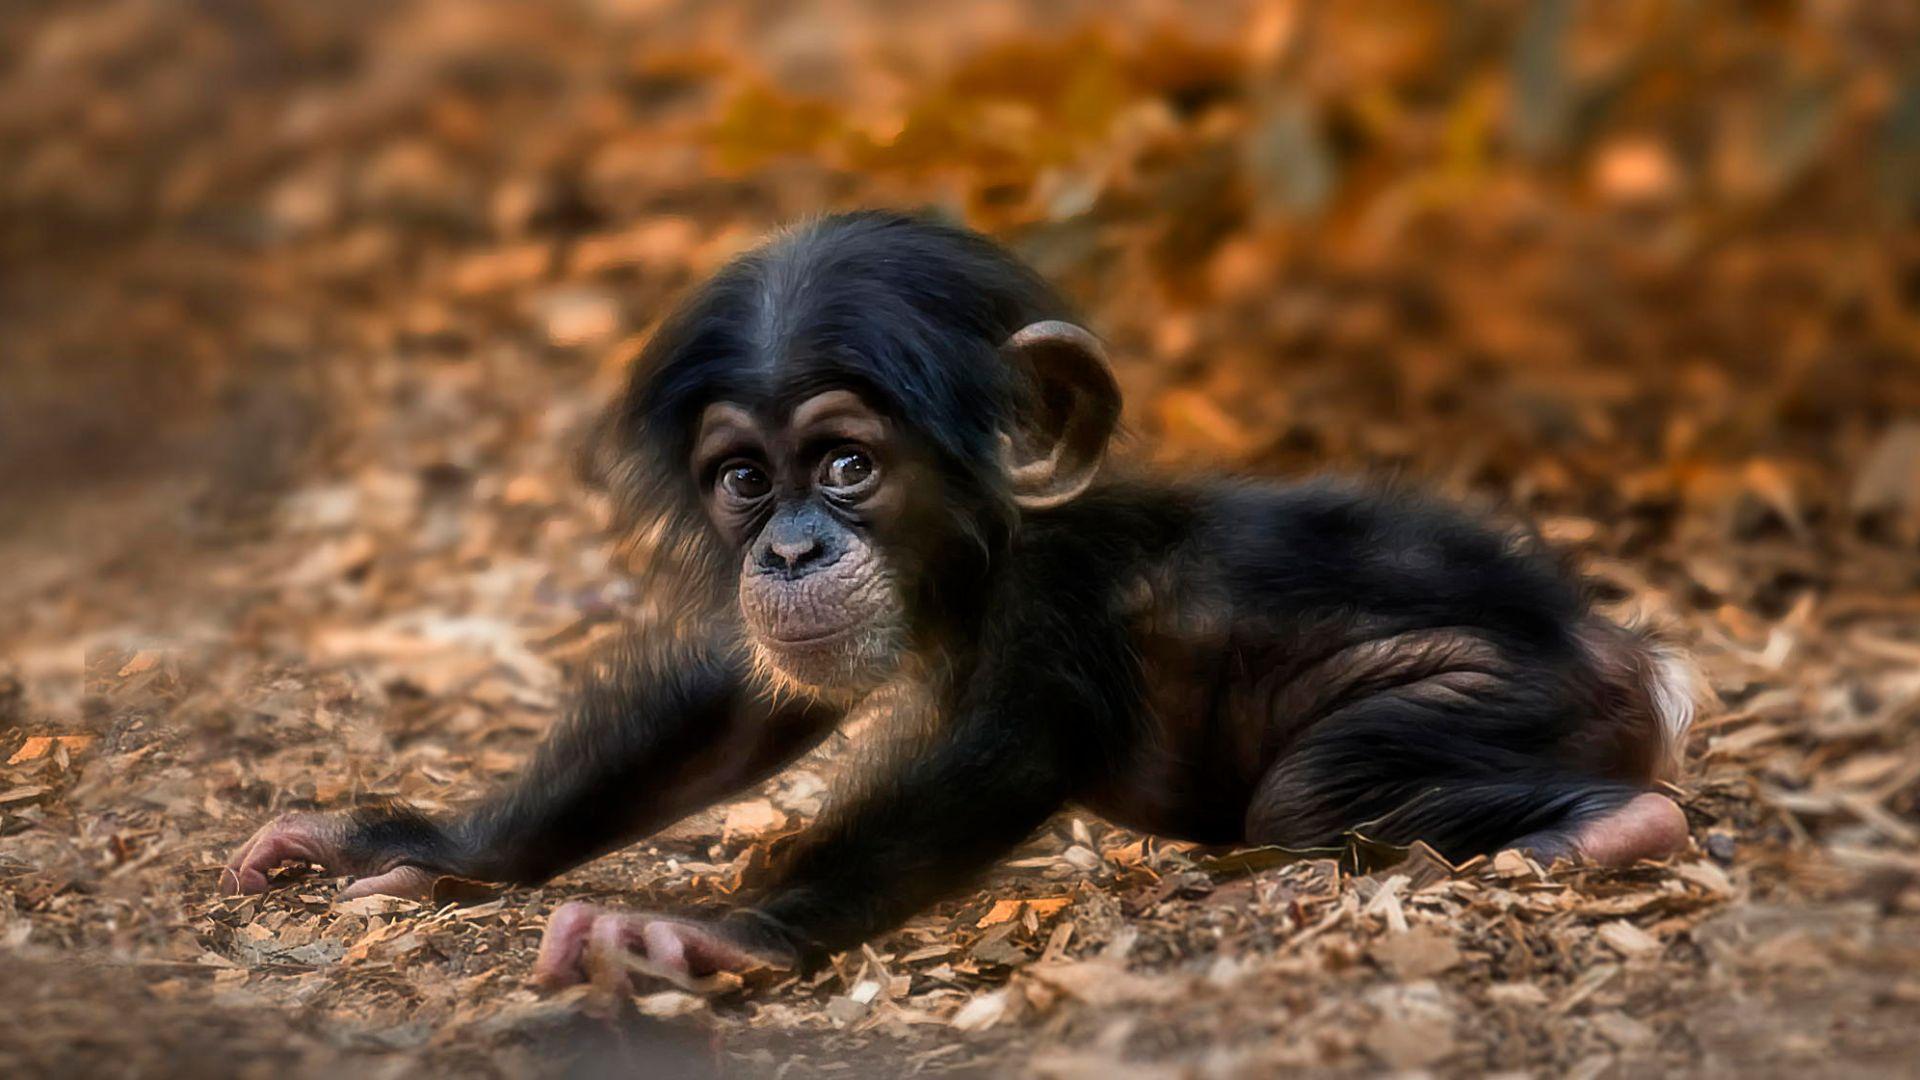 Wallpaper Baby animal, monkey, adorable